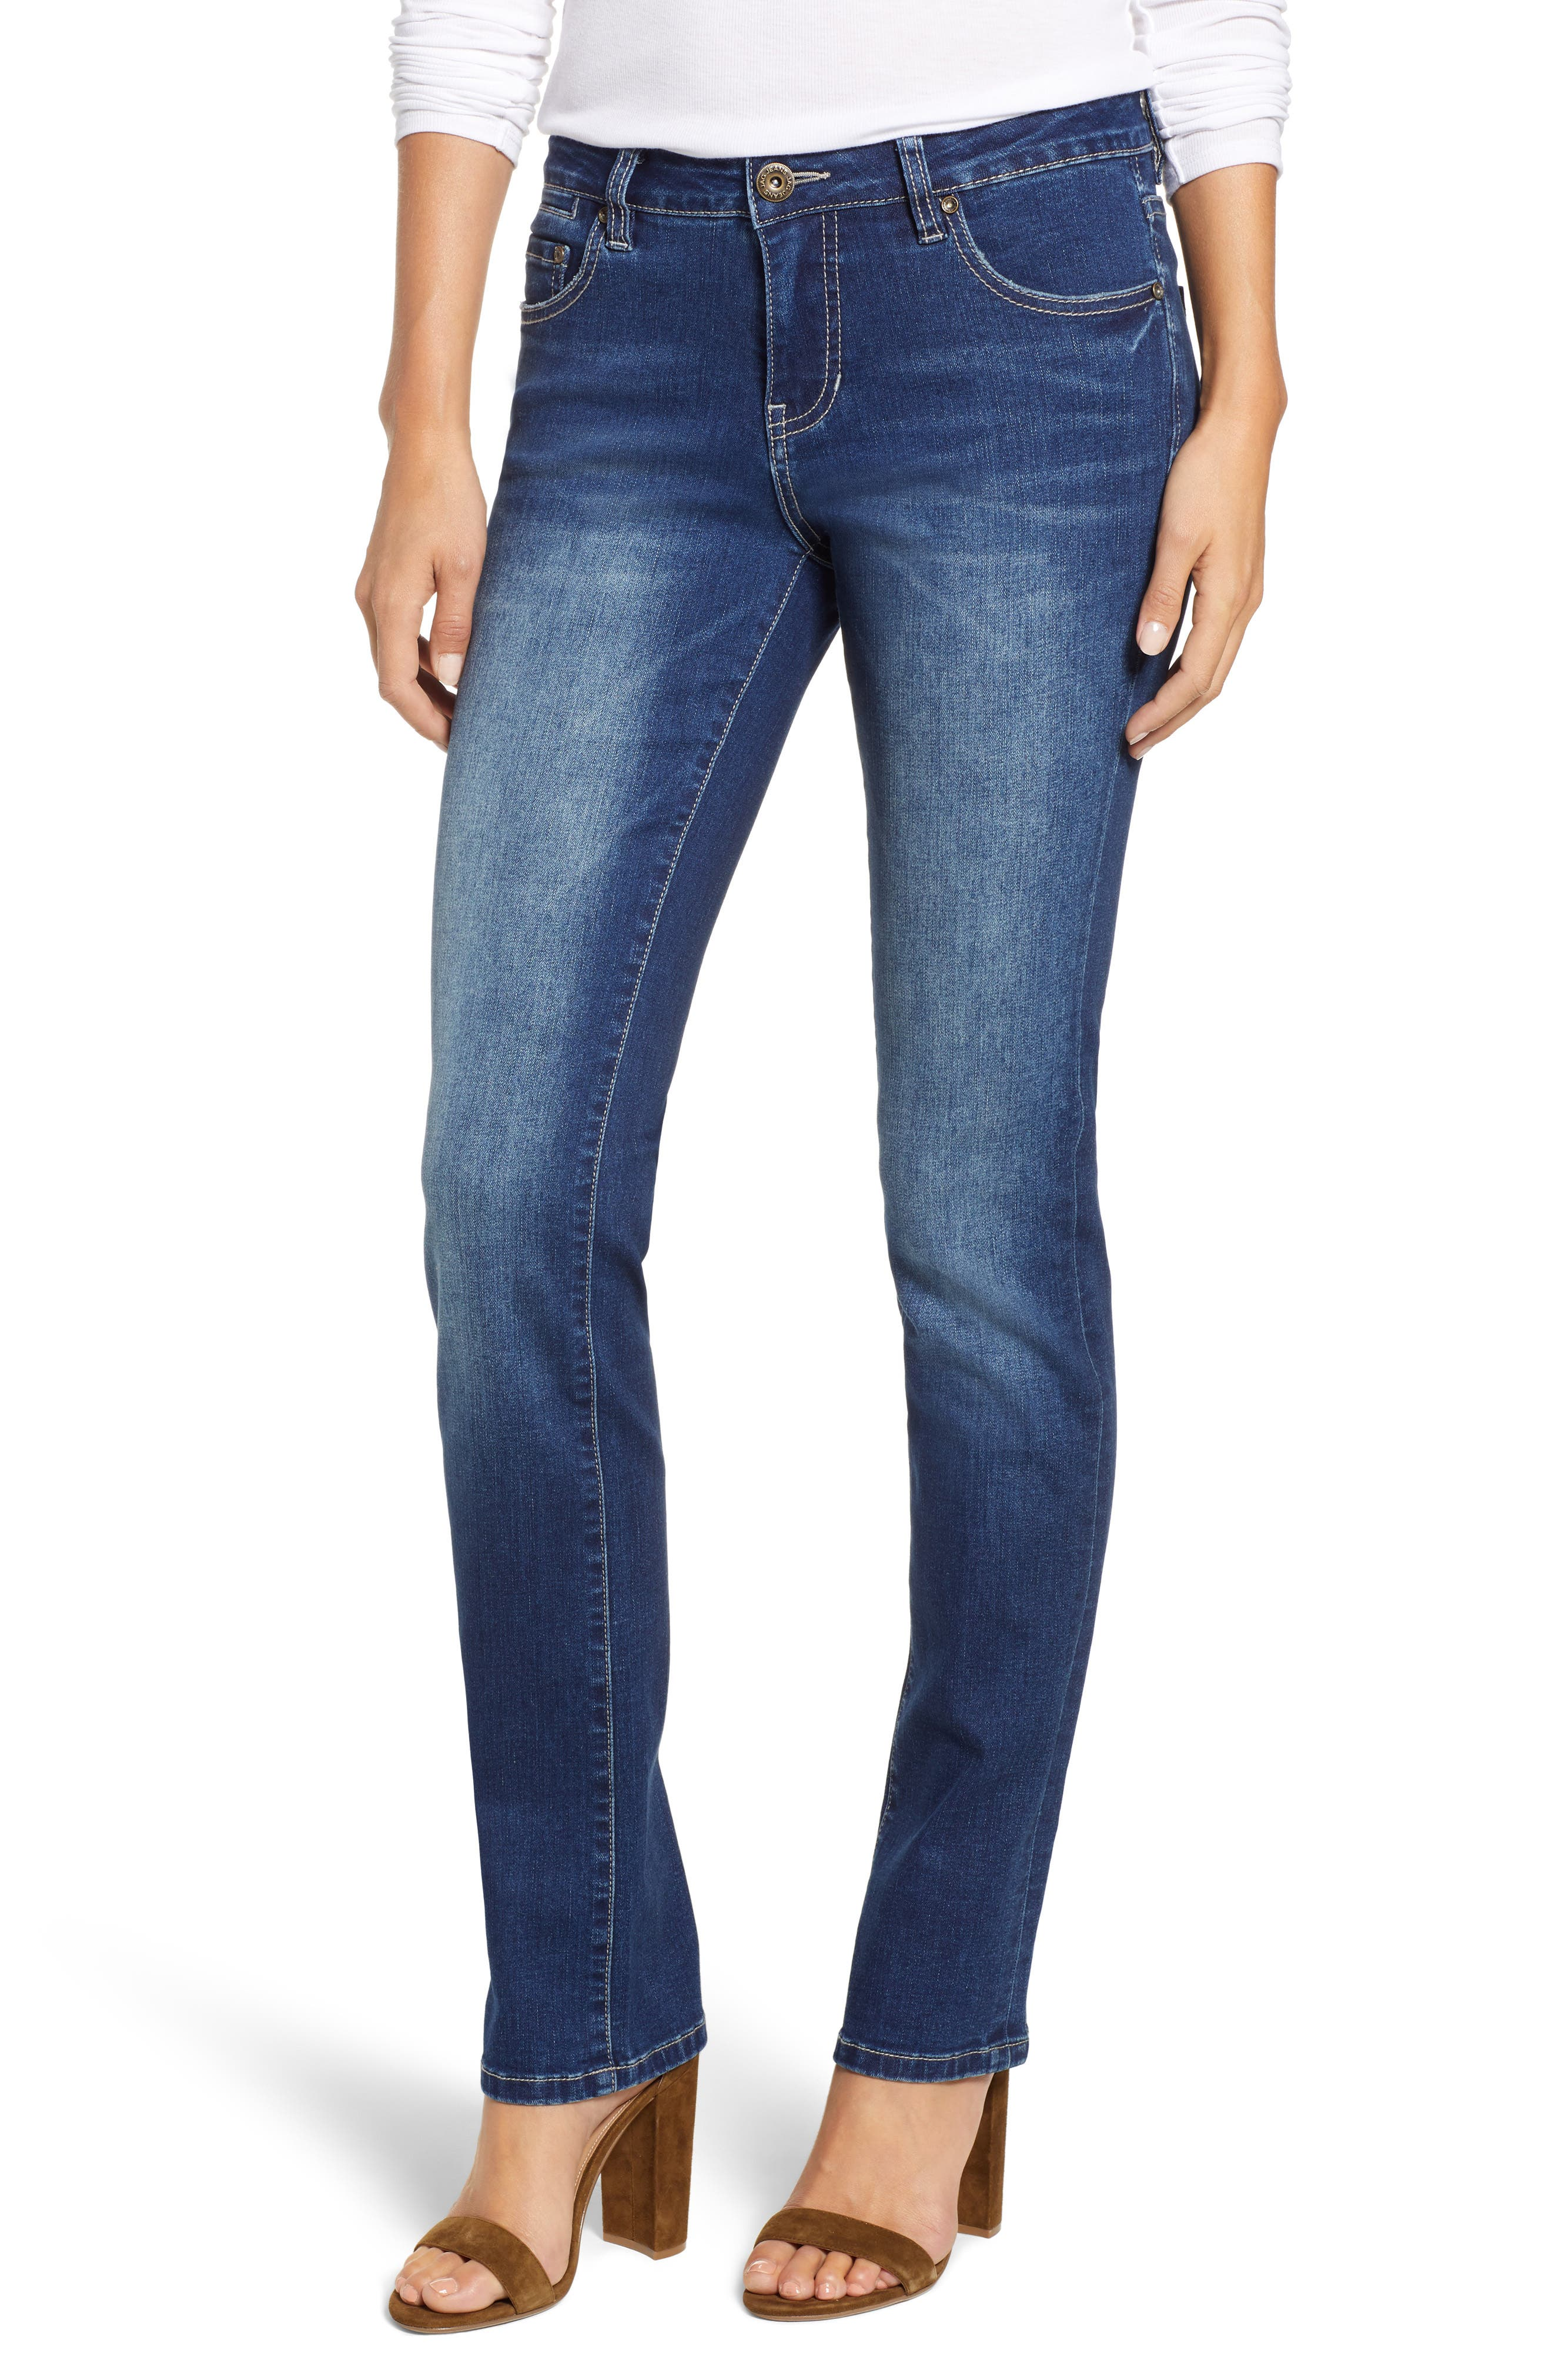 JAG JEANS, Hanna Stretch Straight Leg Jeans, Main thumbnail 1, color, MED INDIGO